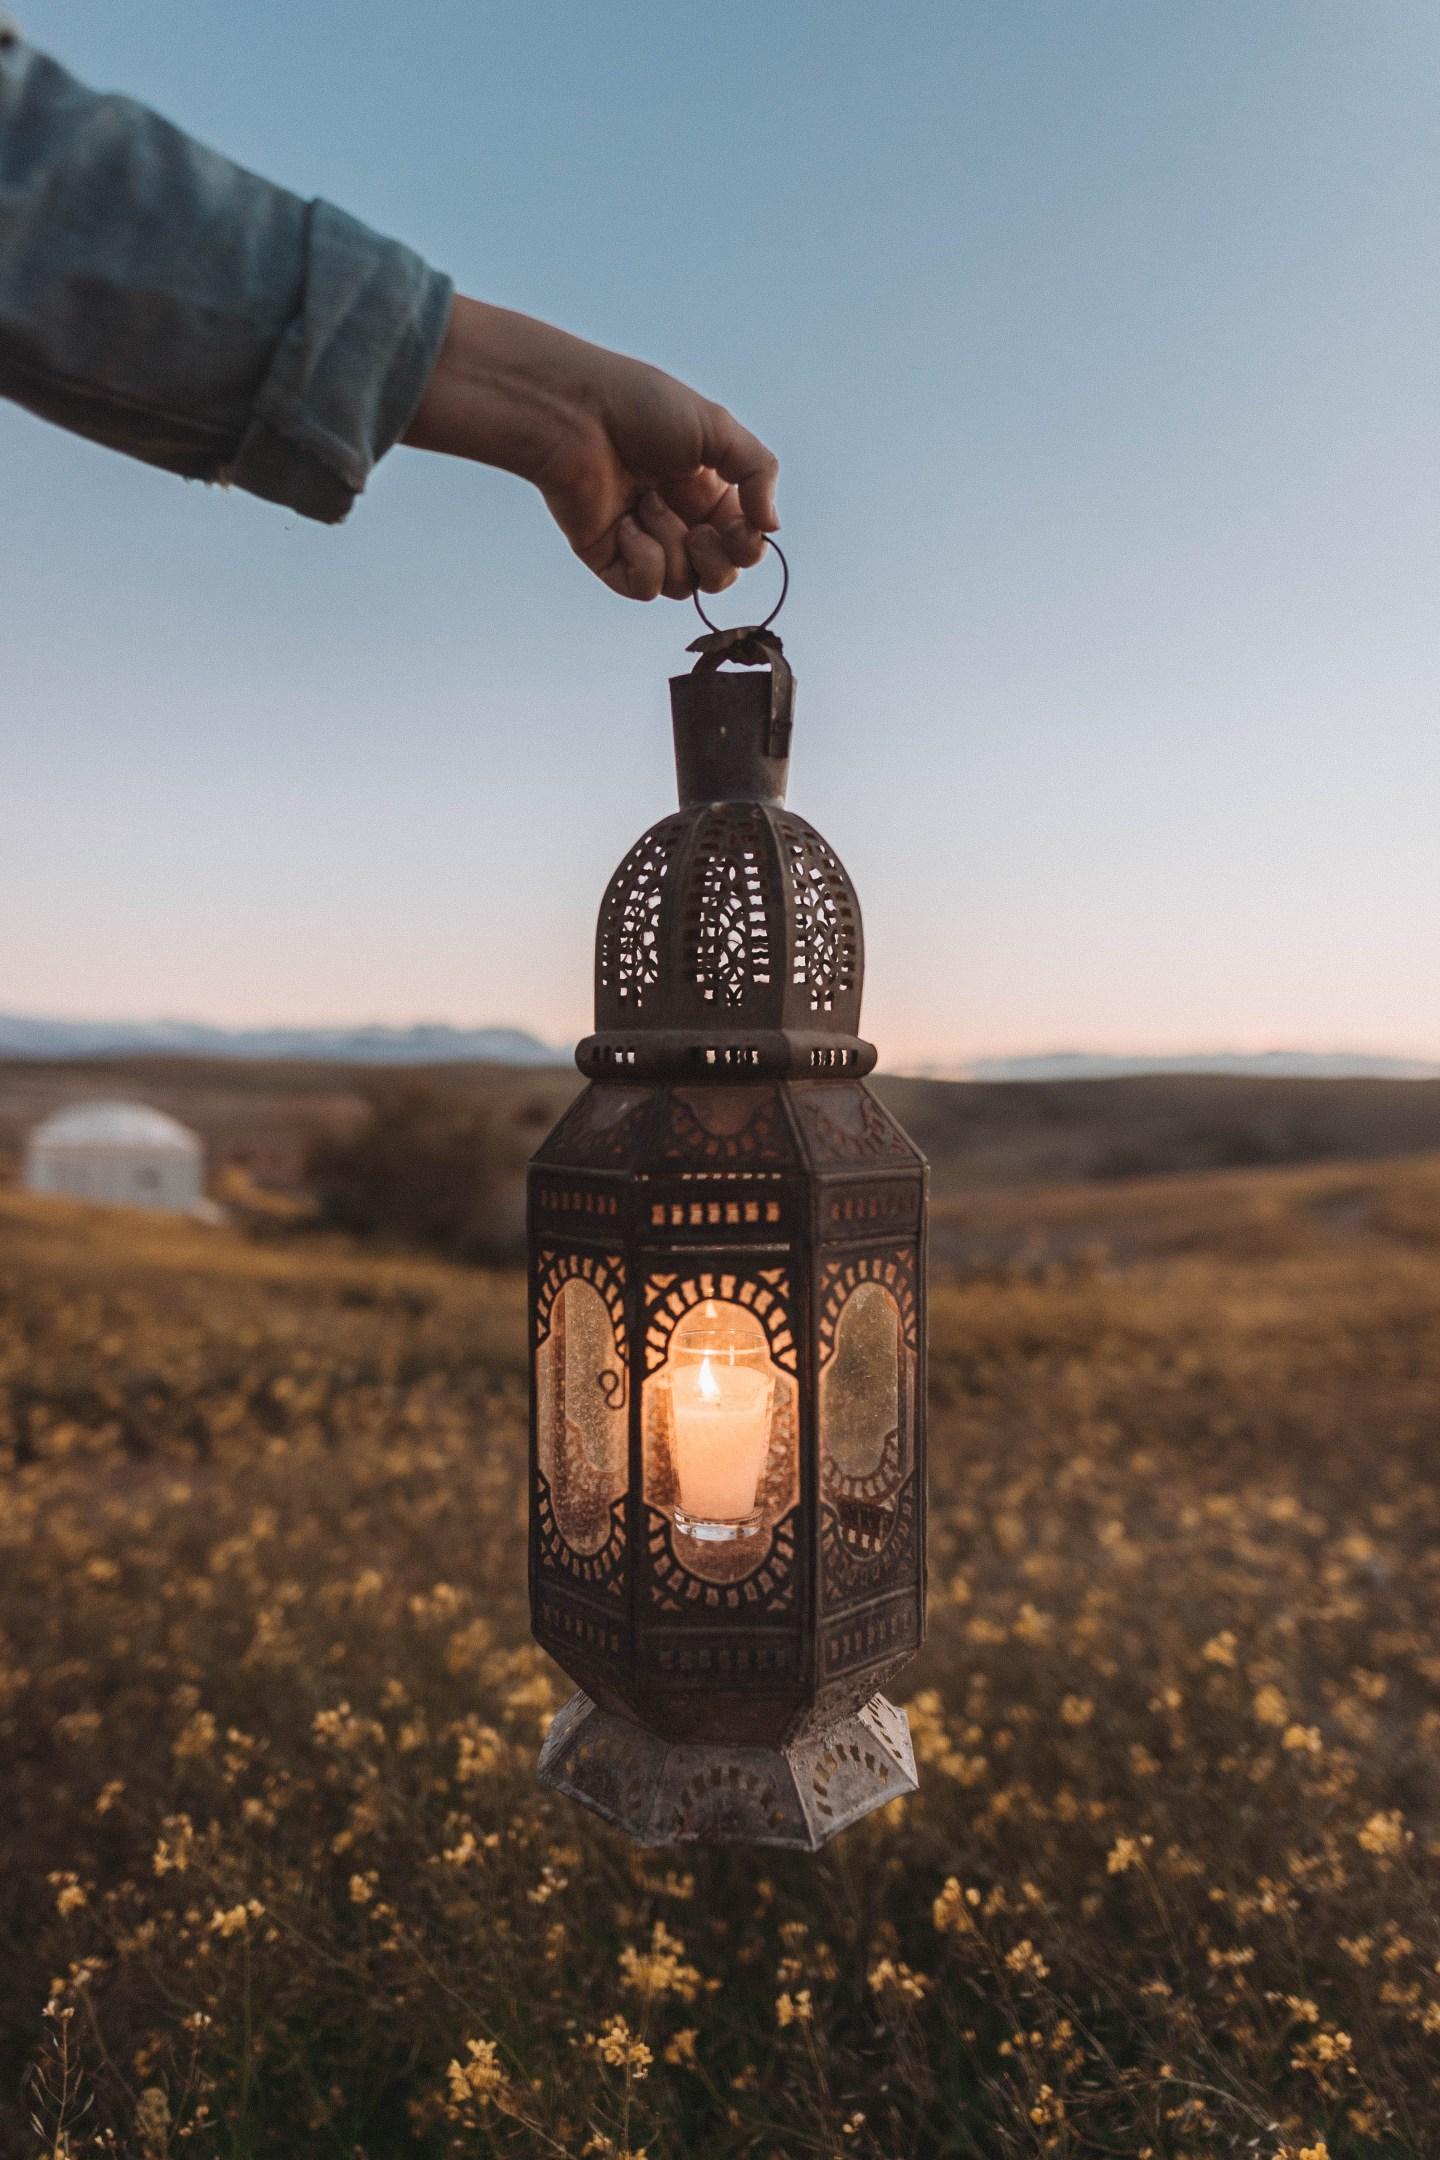 Moroccan lantern in Agafay desert at dusk